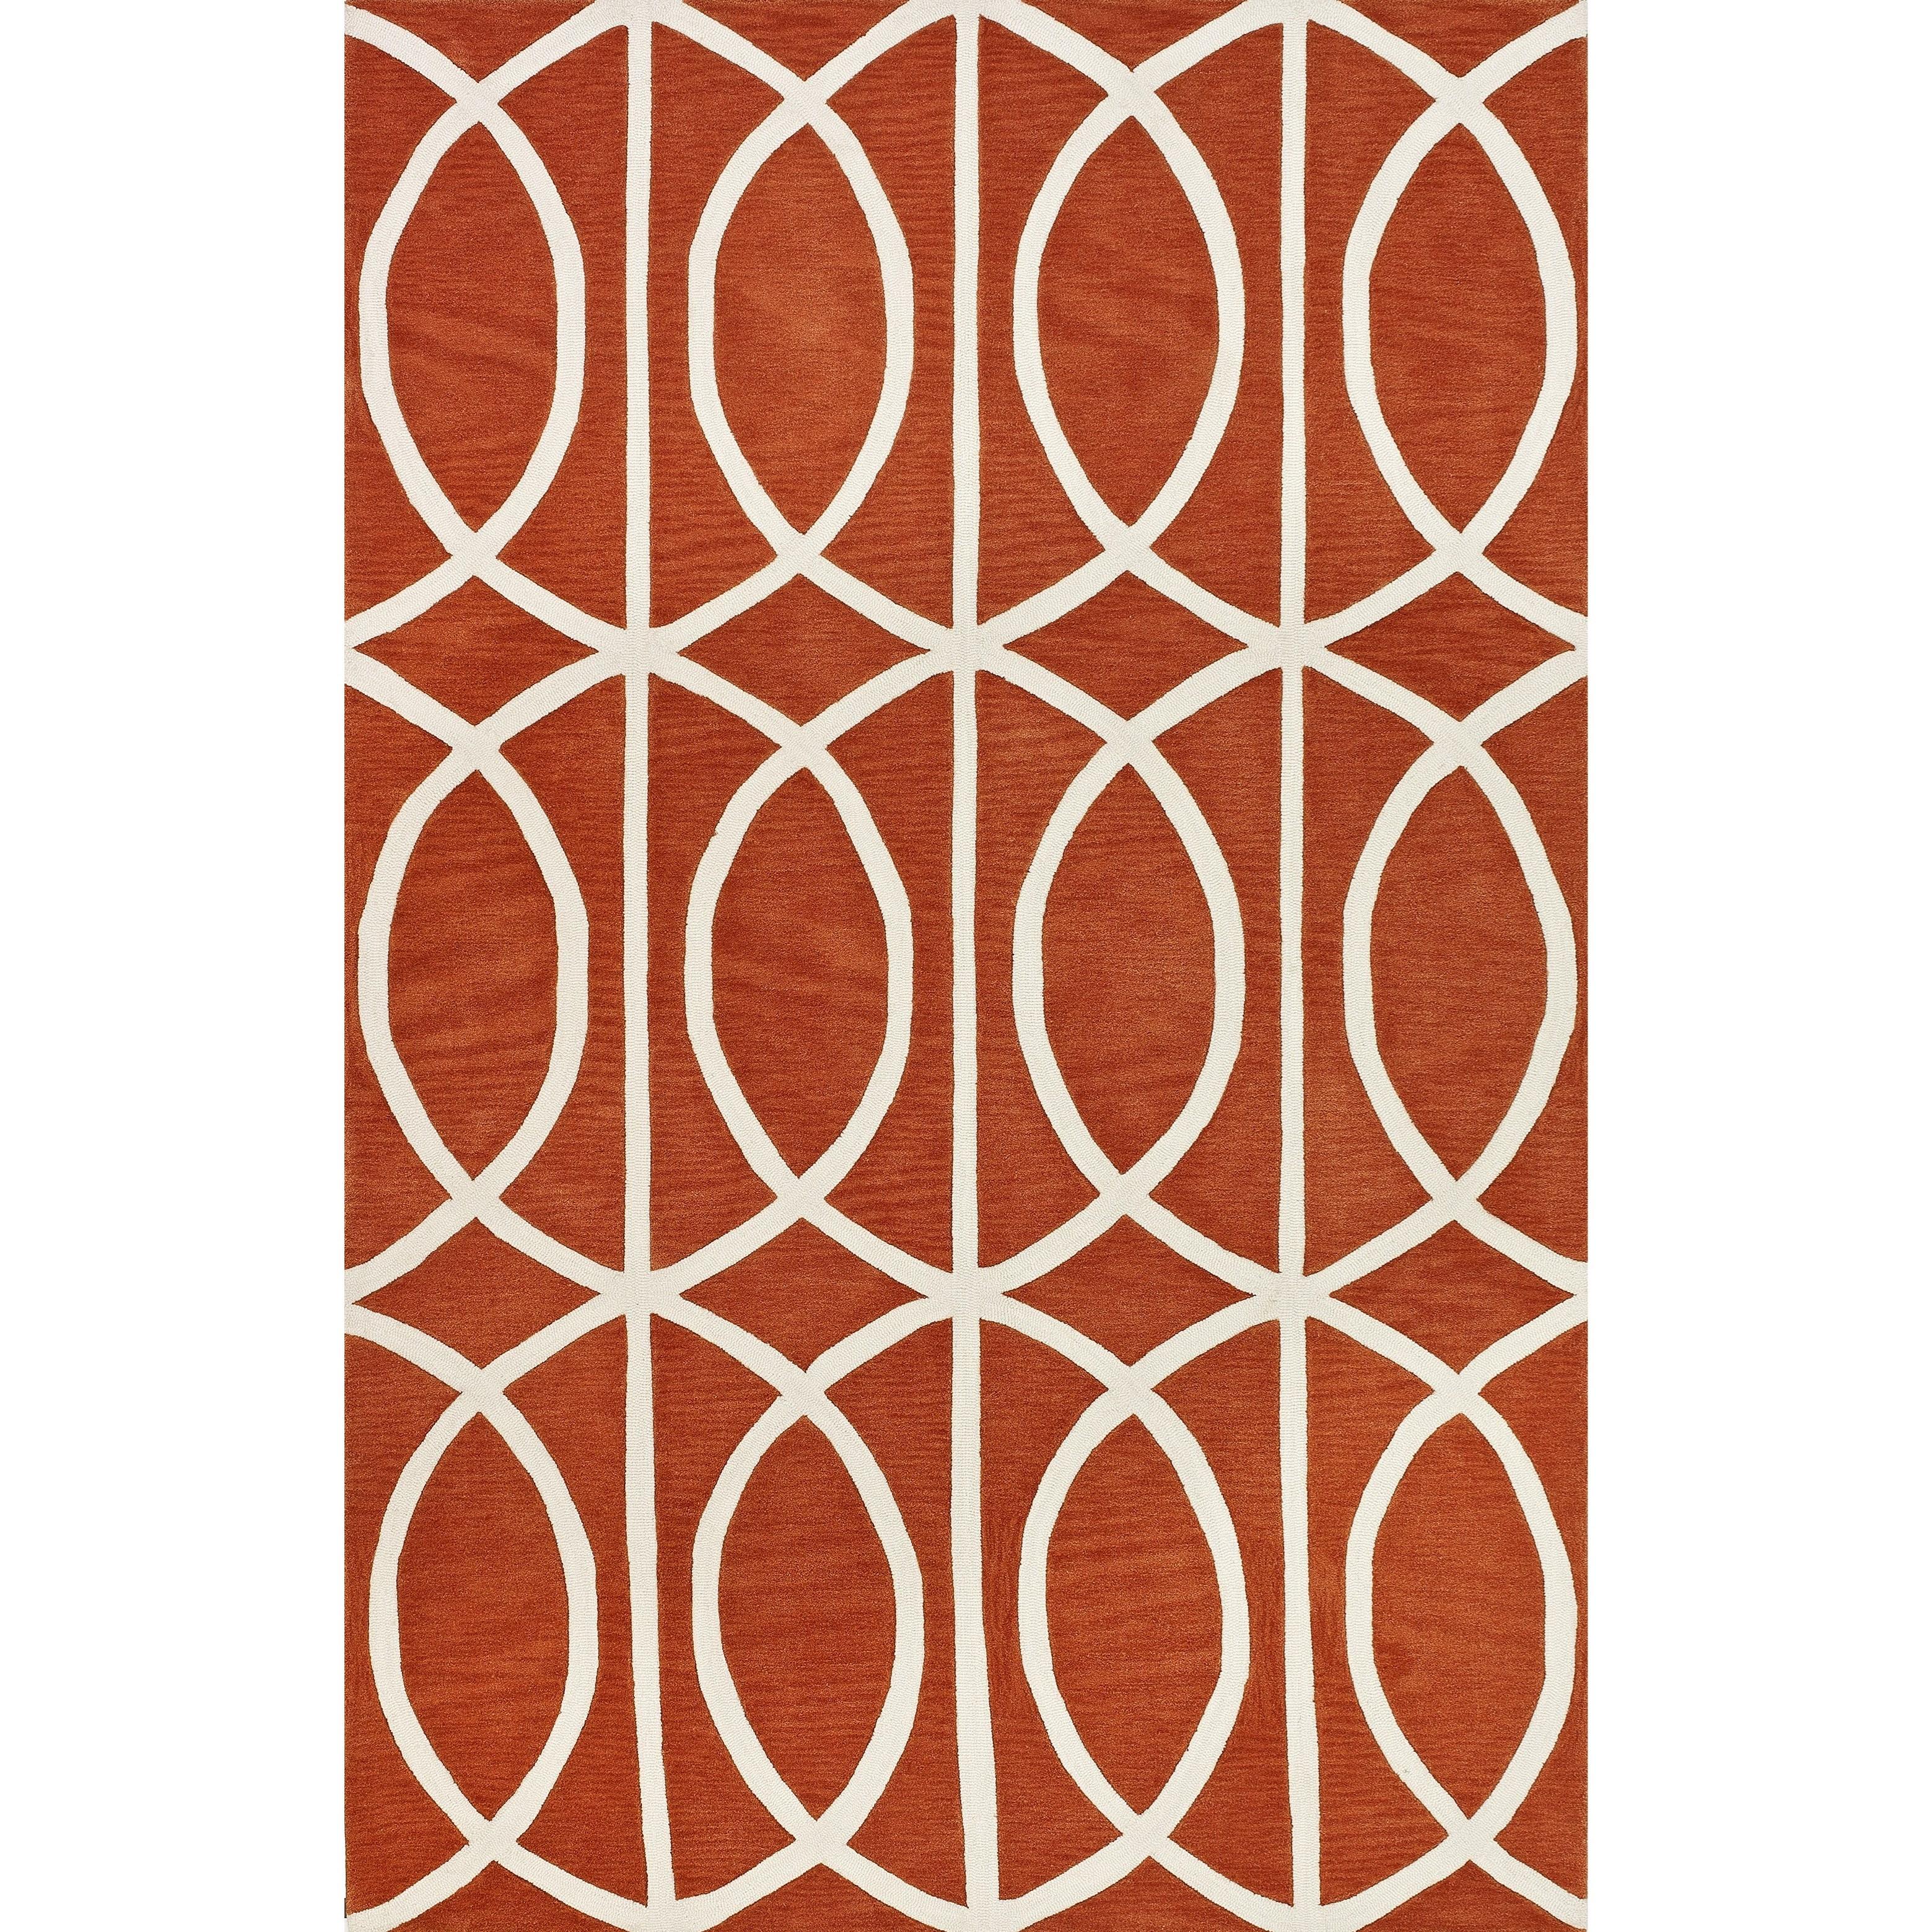 "Infinity Pumpkin 5'X7'6"" Rug by Dalyn at Arwood's Furniture"